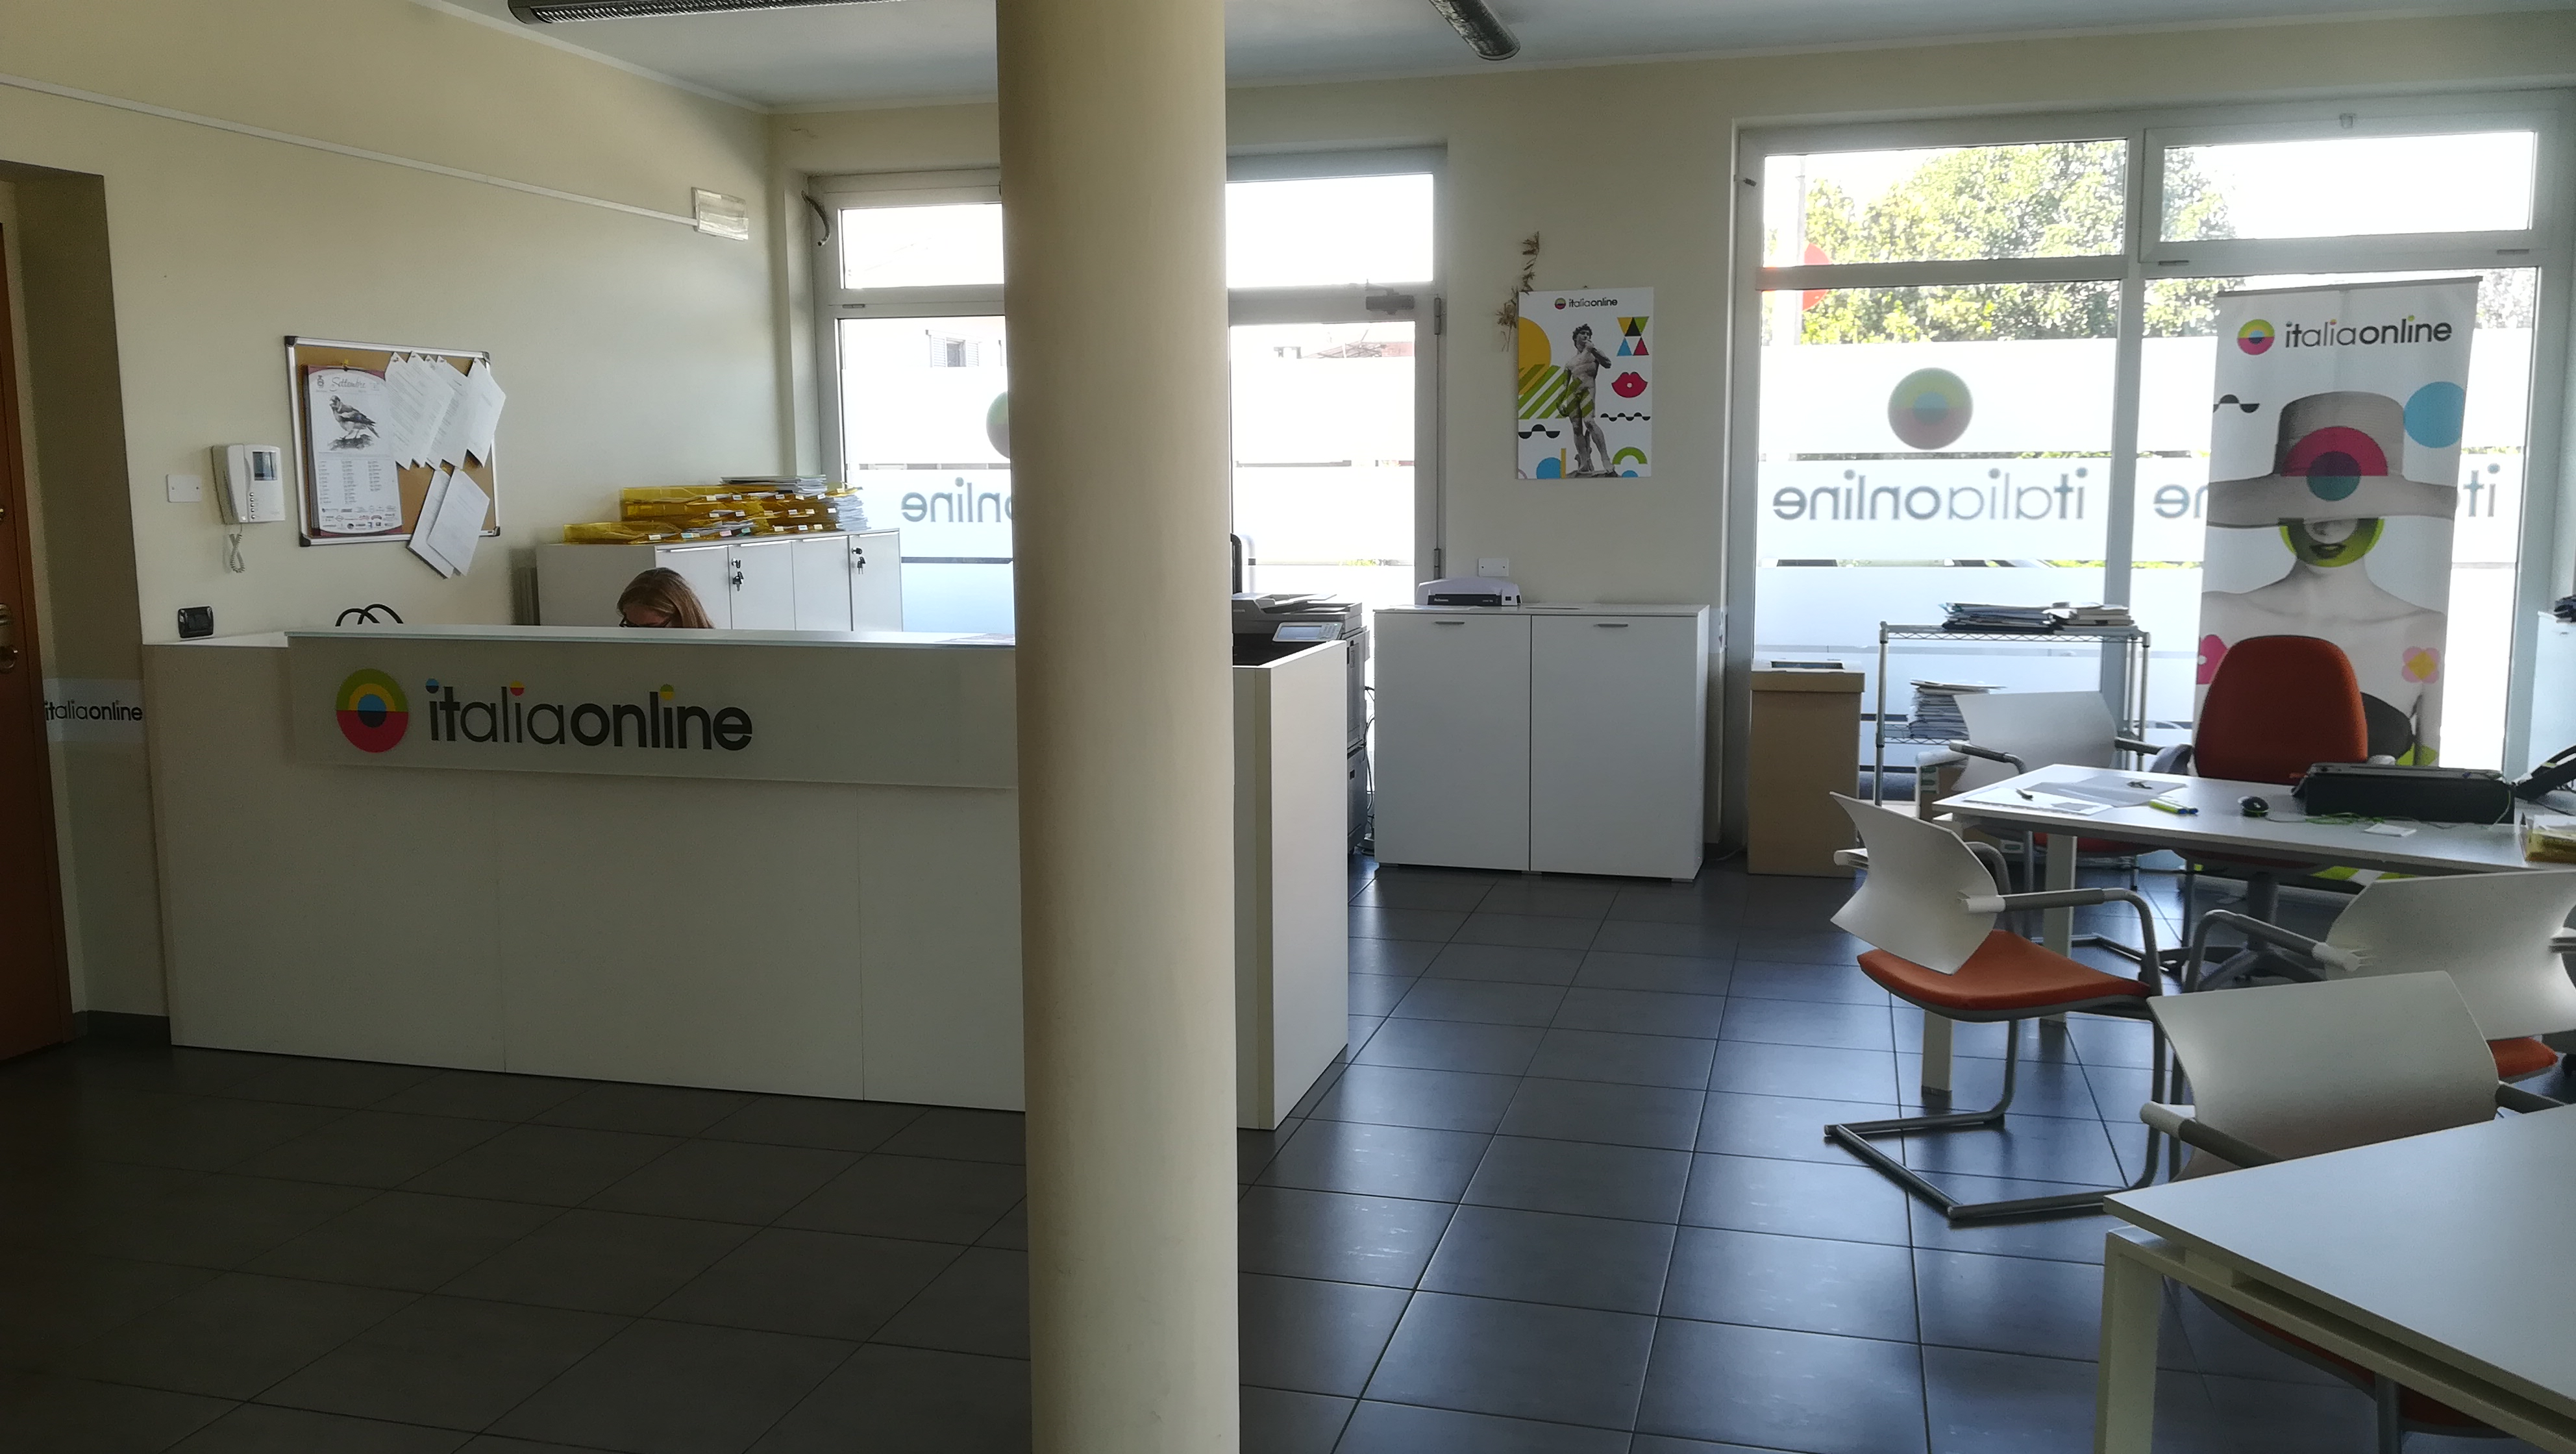 Web Agency Italiaonline a Cuneo